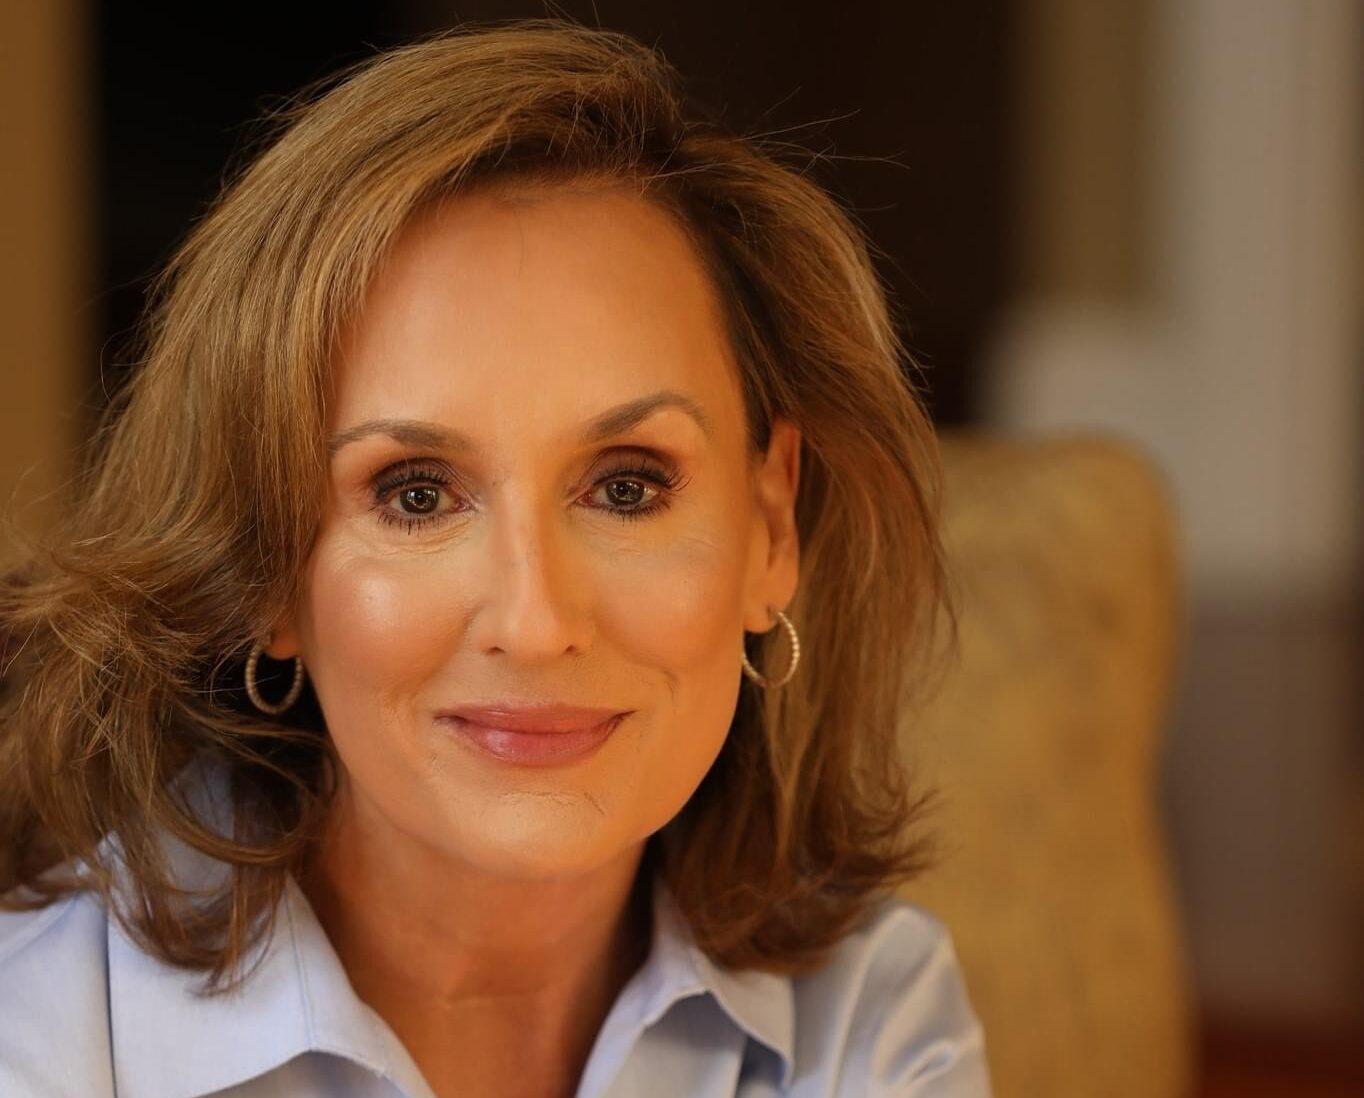 THE FLORIDIAN: Rep. Allison Tant